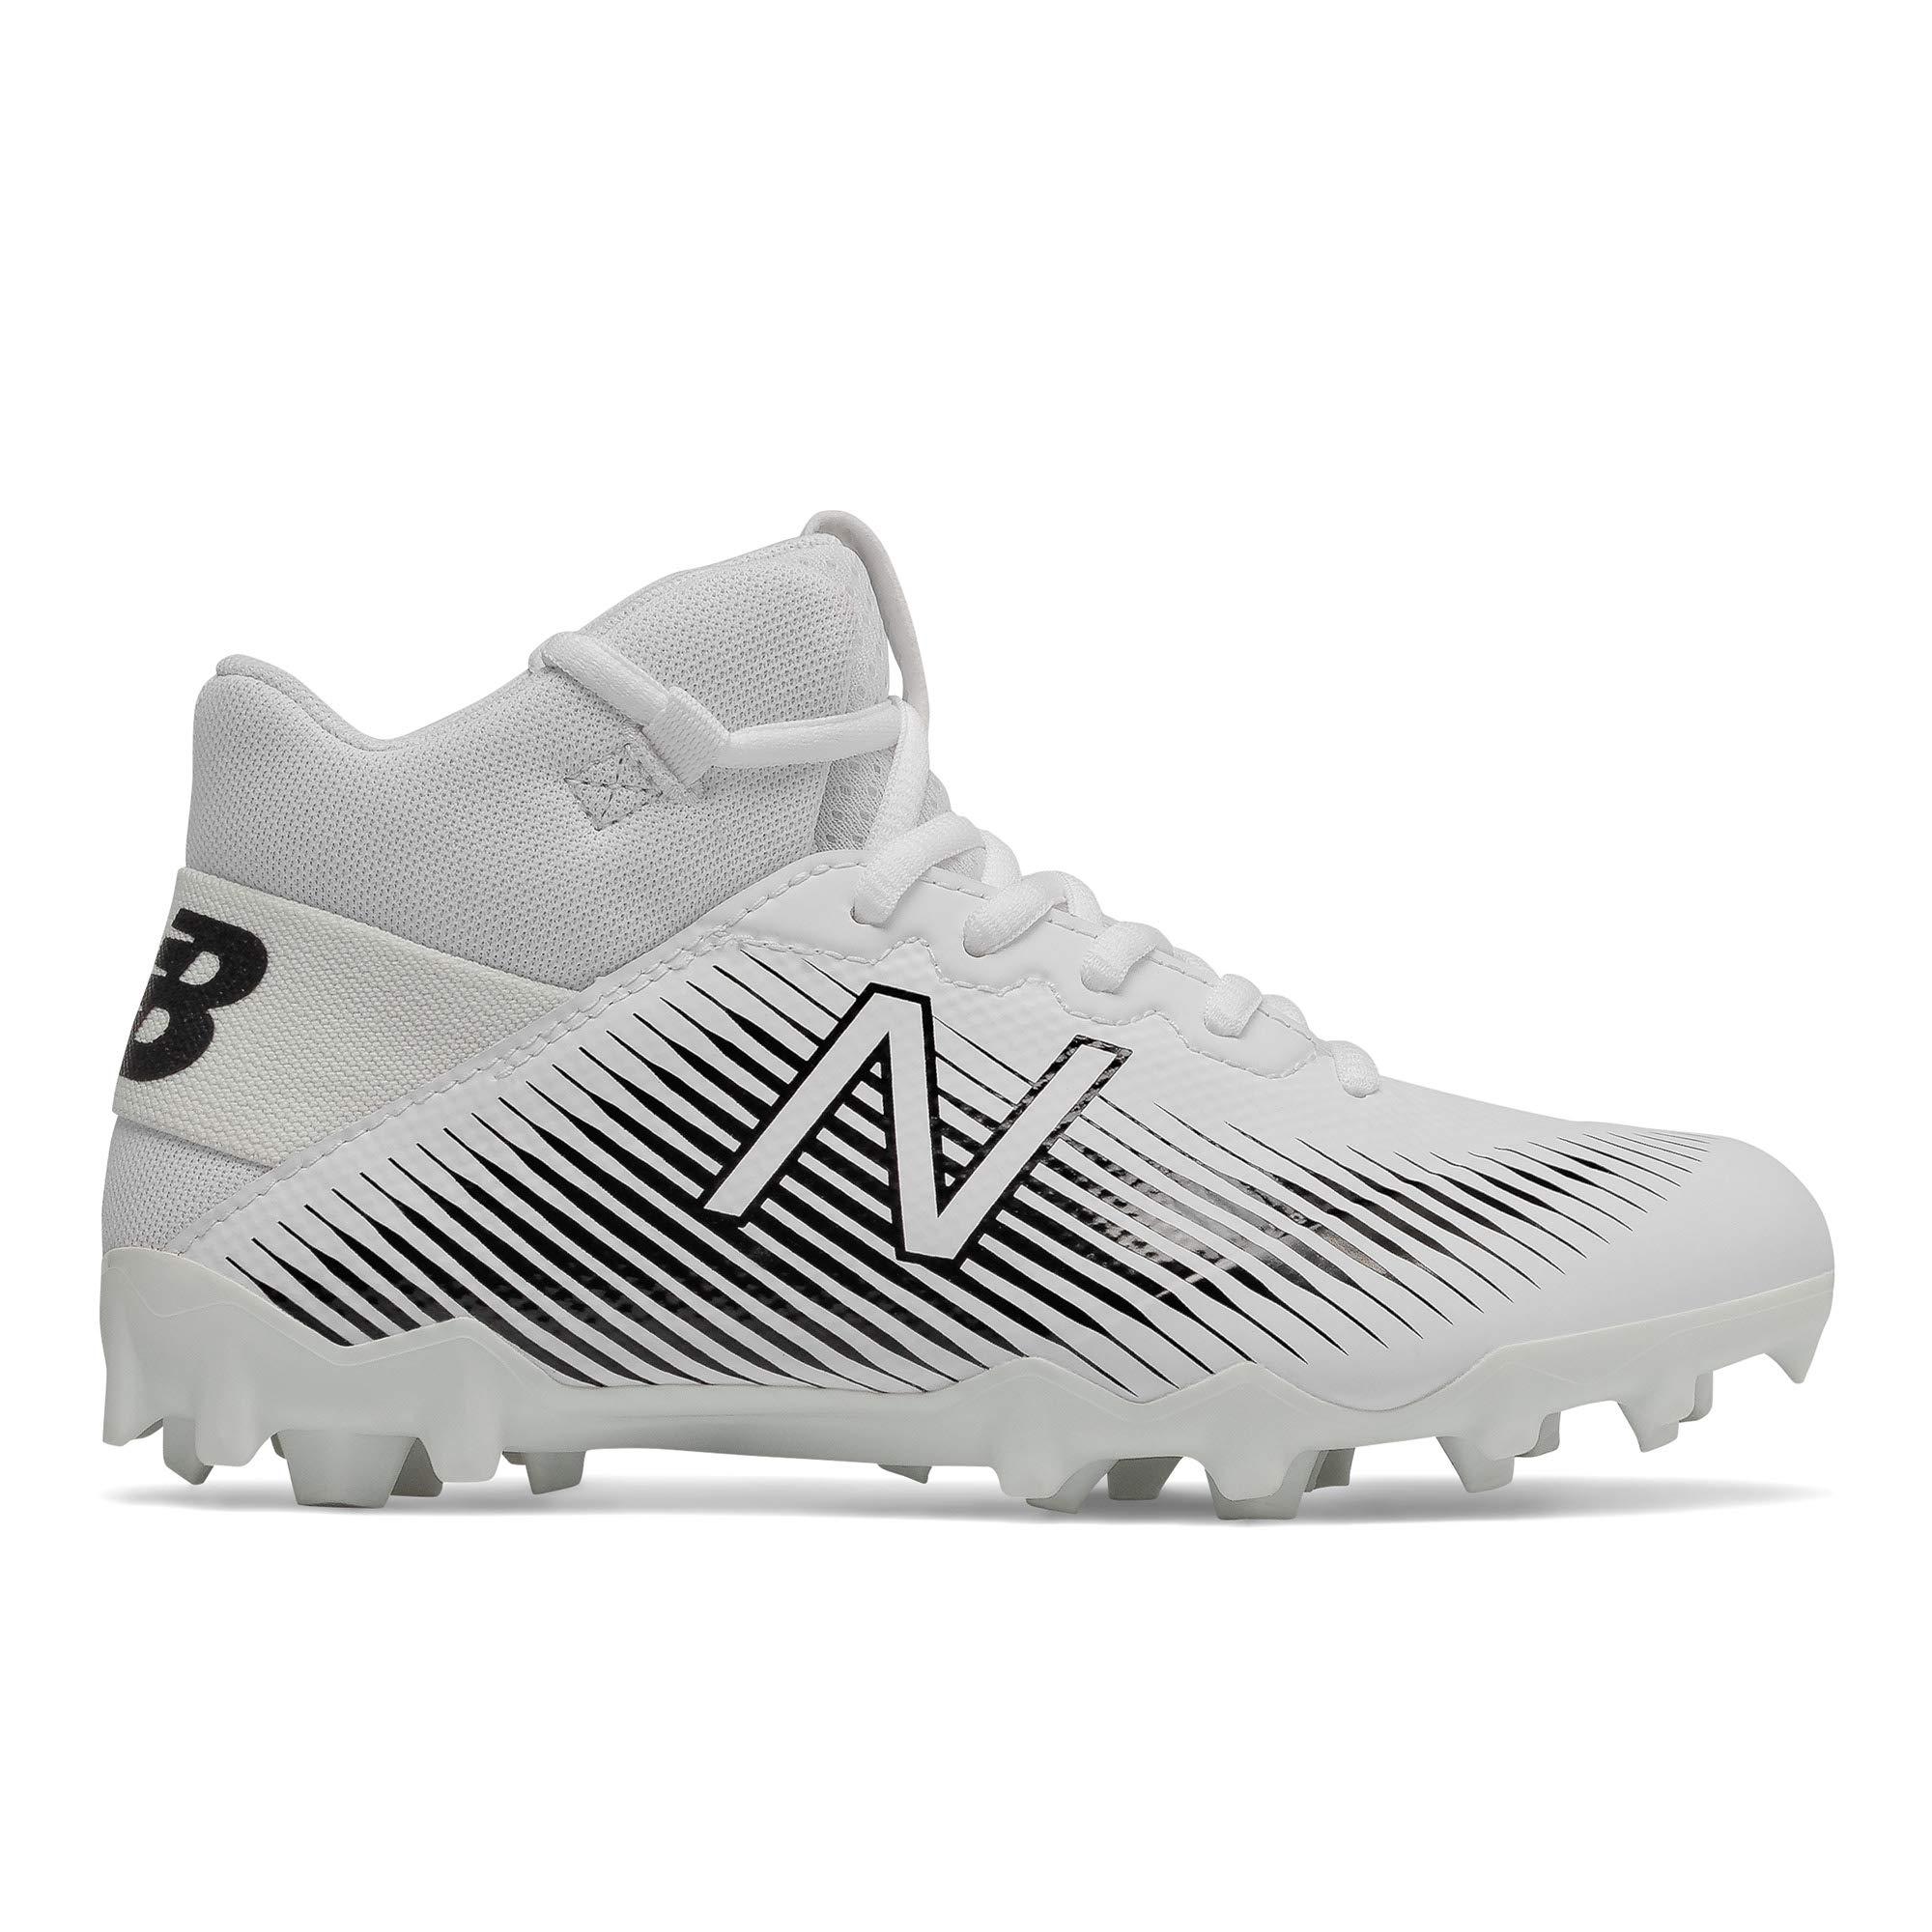 New Balance Boys' Freeze V2 Agility Lacrosse Shoe, White/Black, 4 M US Big Kid